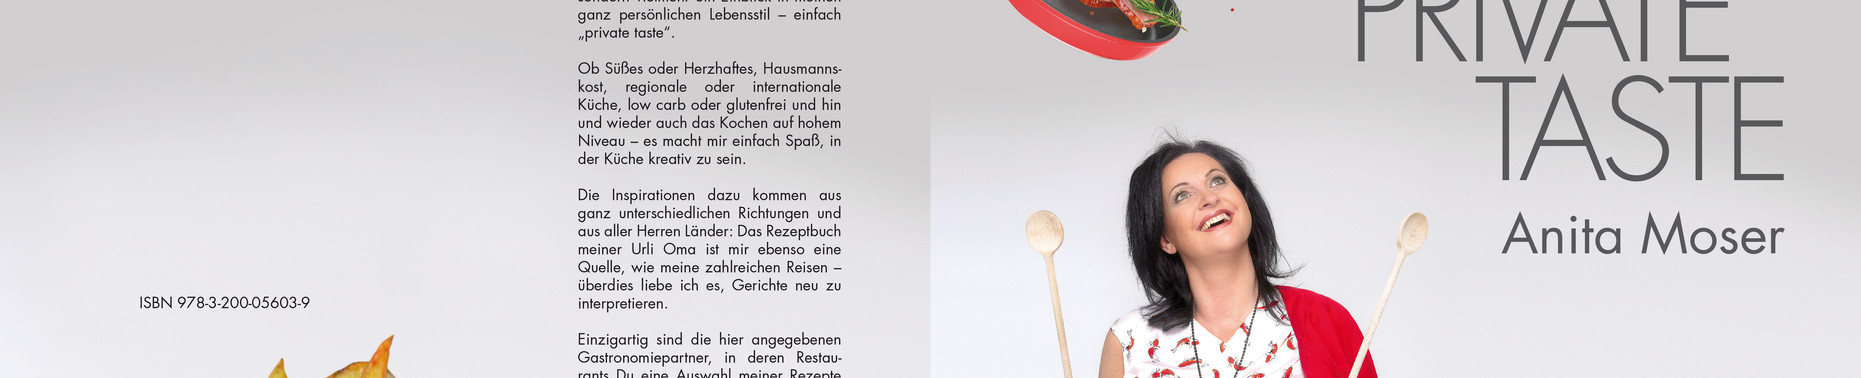 Private_Taste_Umschlag.jpg